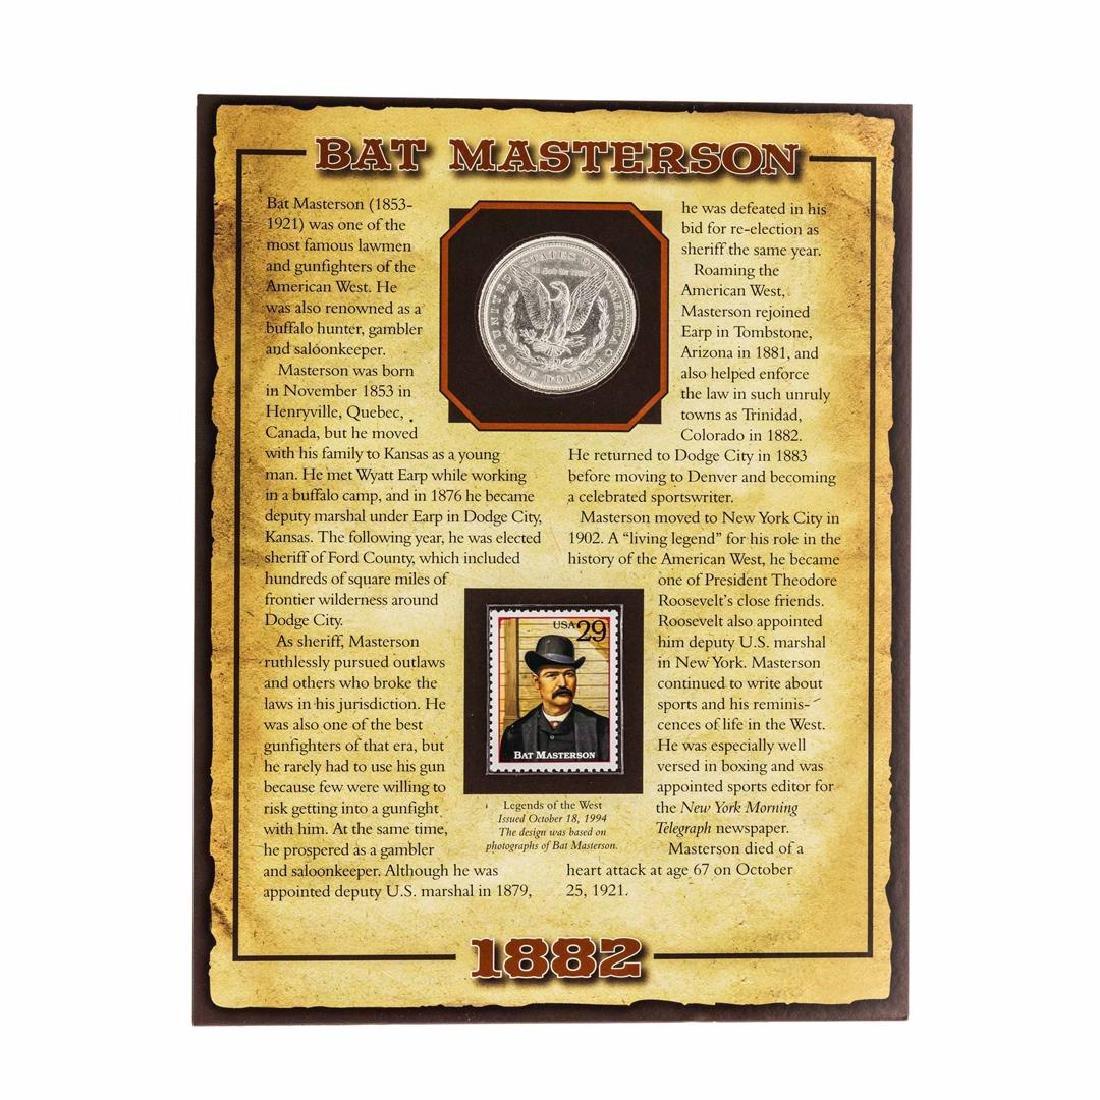 1882 $1 Morgan Silver Dollar Coin with Bat Masterson - 2